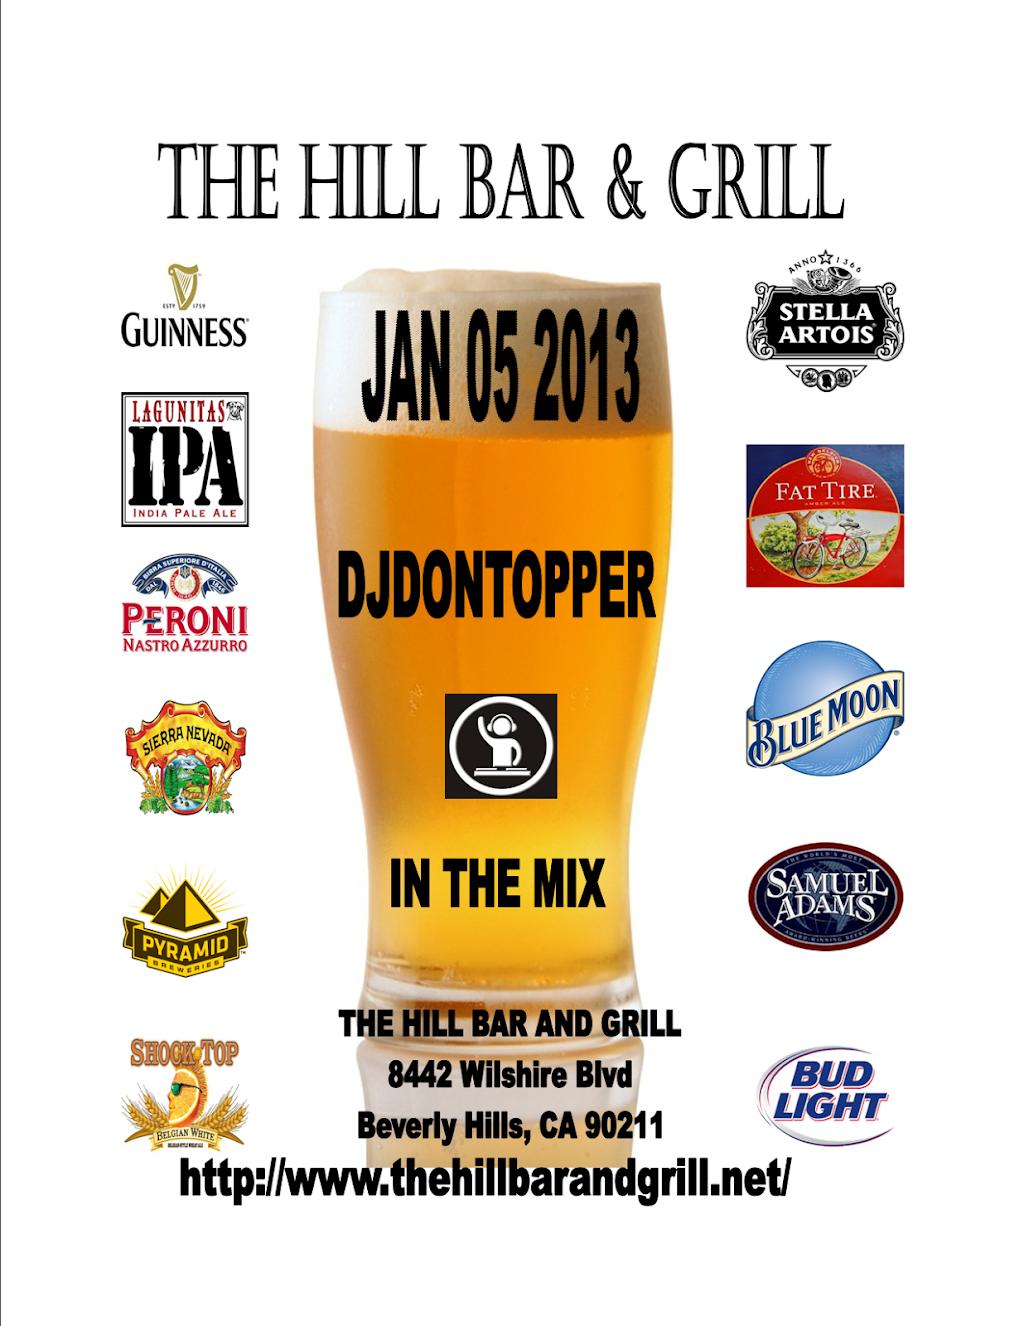 Hill Bar & Grill | restaurant | 8442 Wilshire Blvd, Beverly Hills, CA 90211, USA | 3239511112 OR +1 323-951-1112